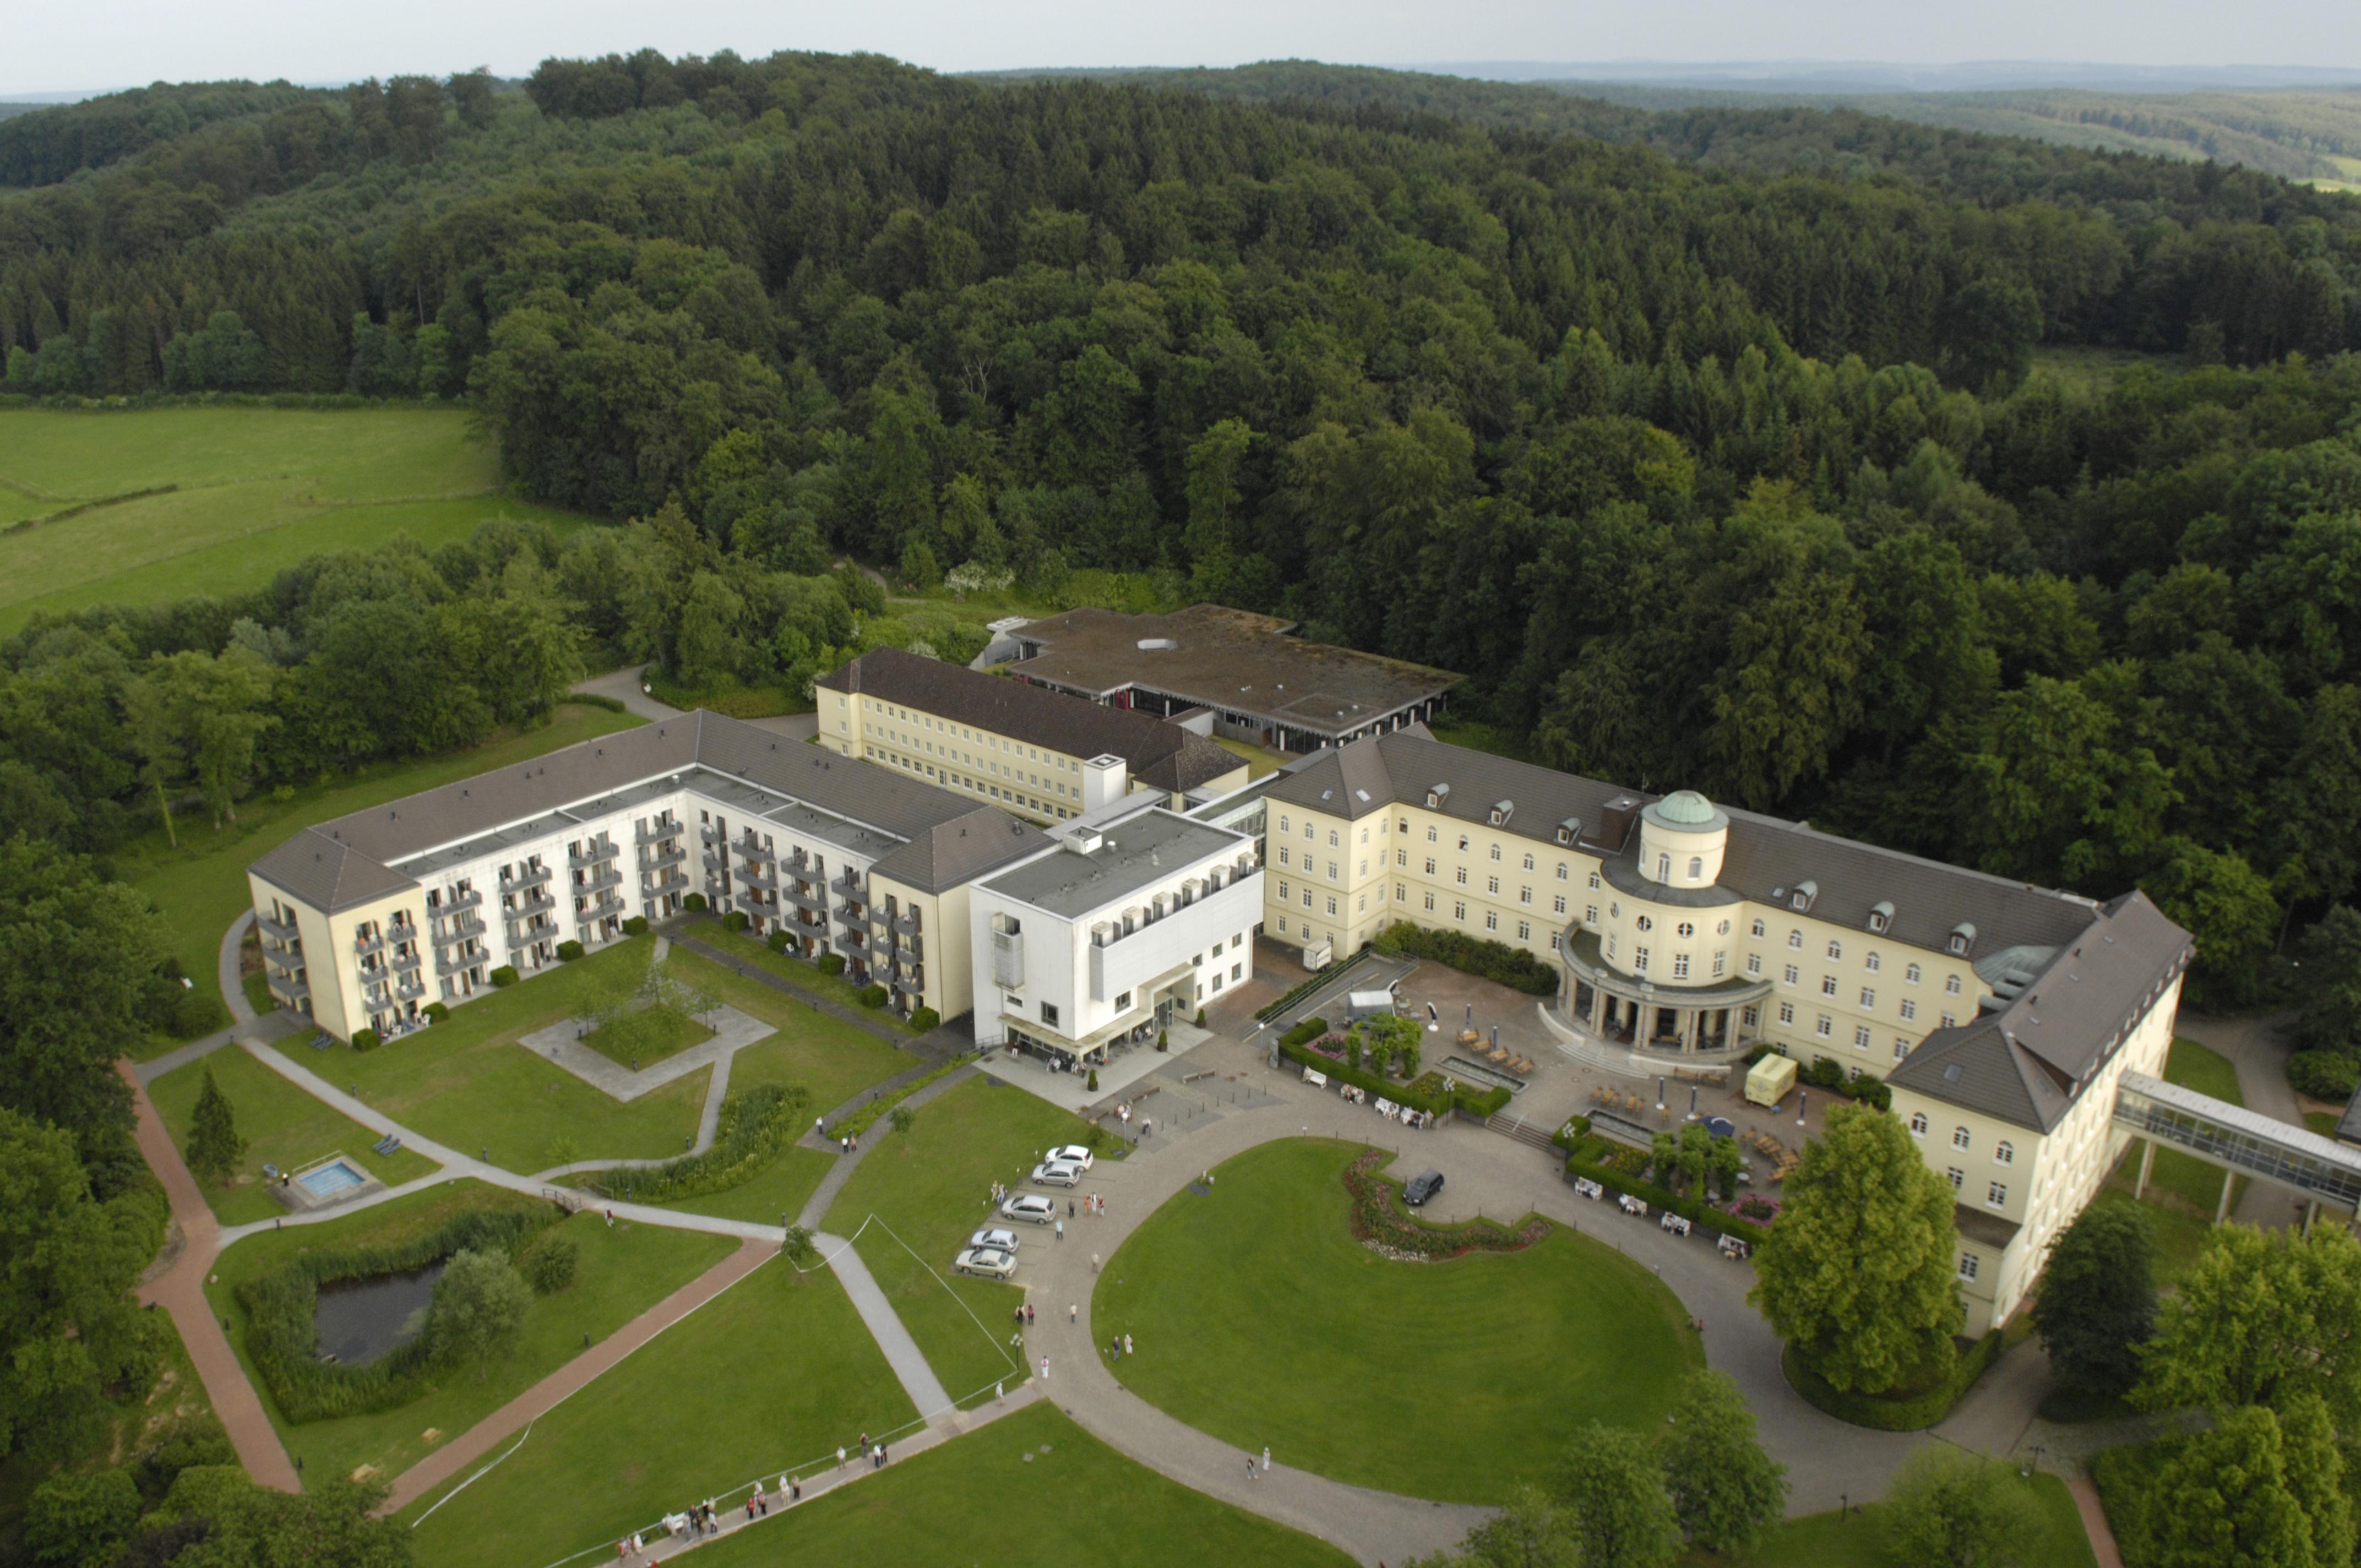 Bad Hermannsborn